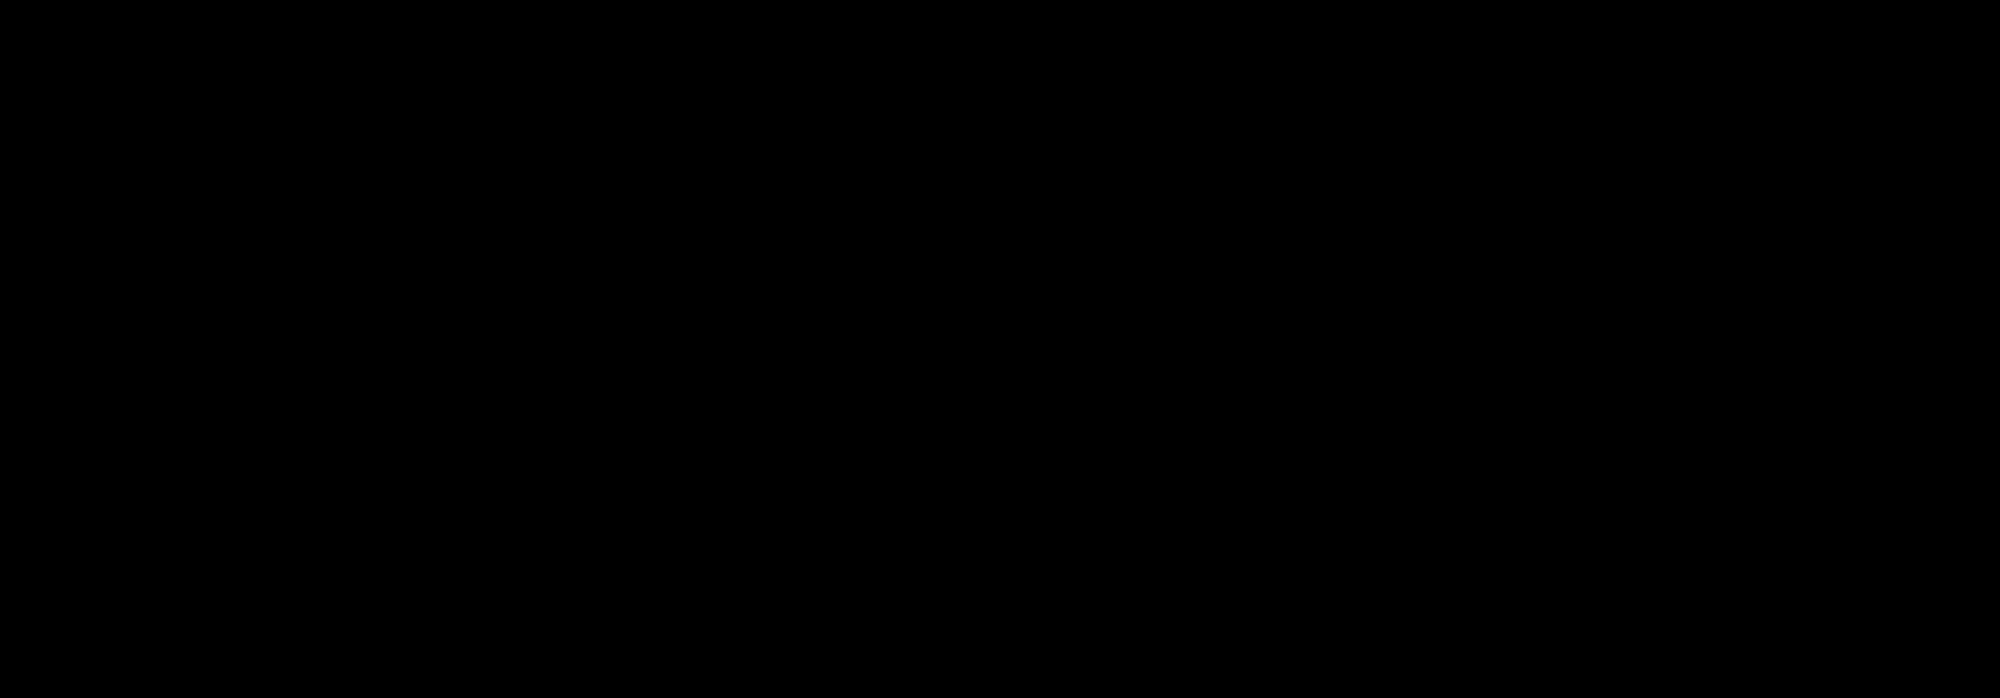 CHURCH ON THE HILL-logo (2).jpg